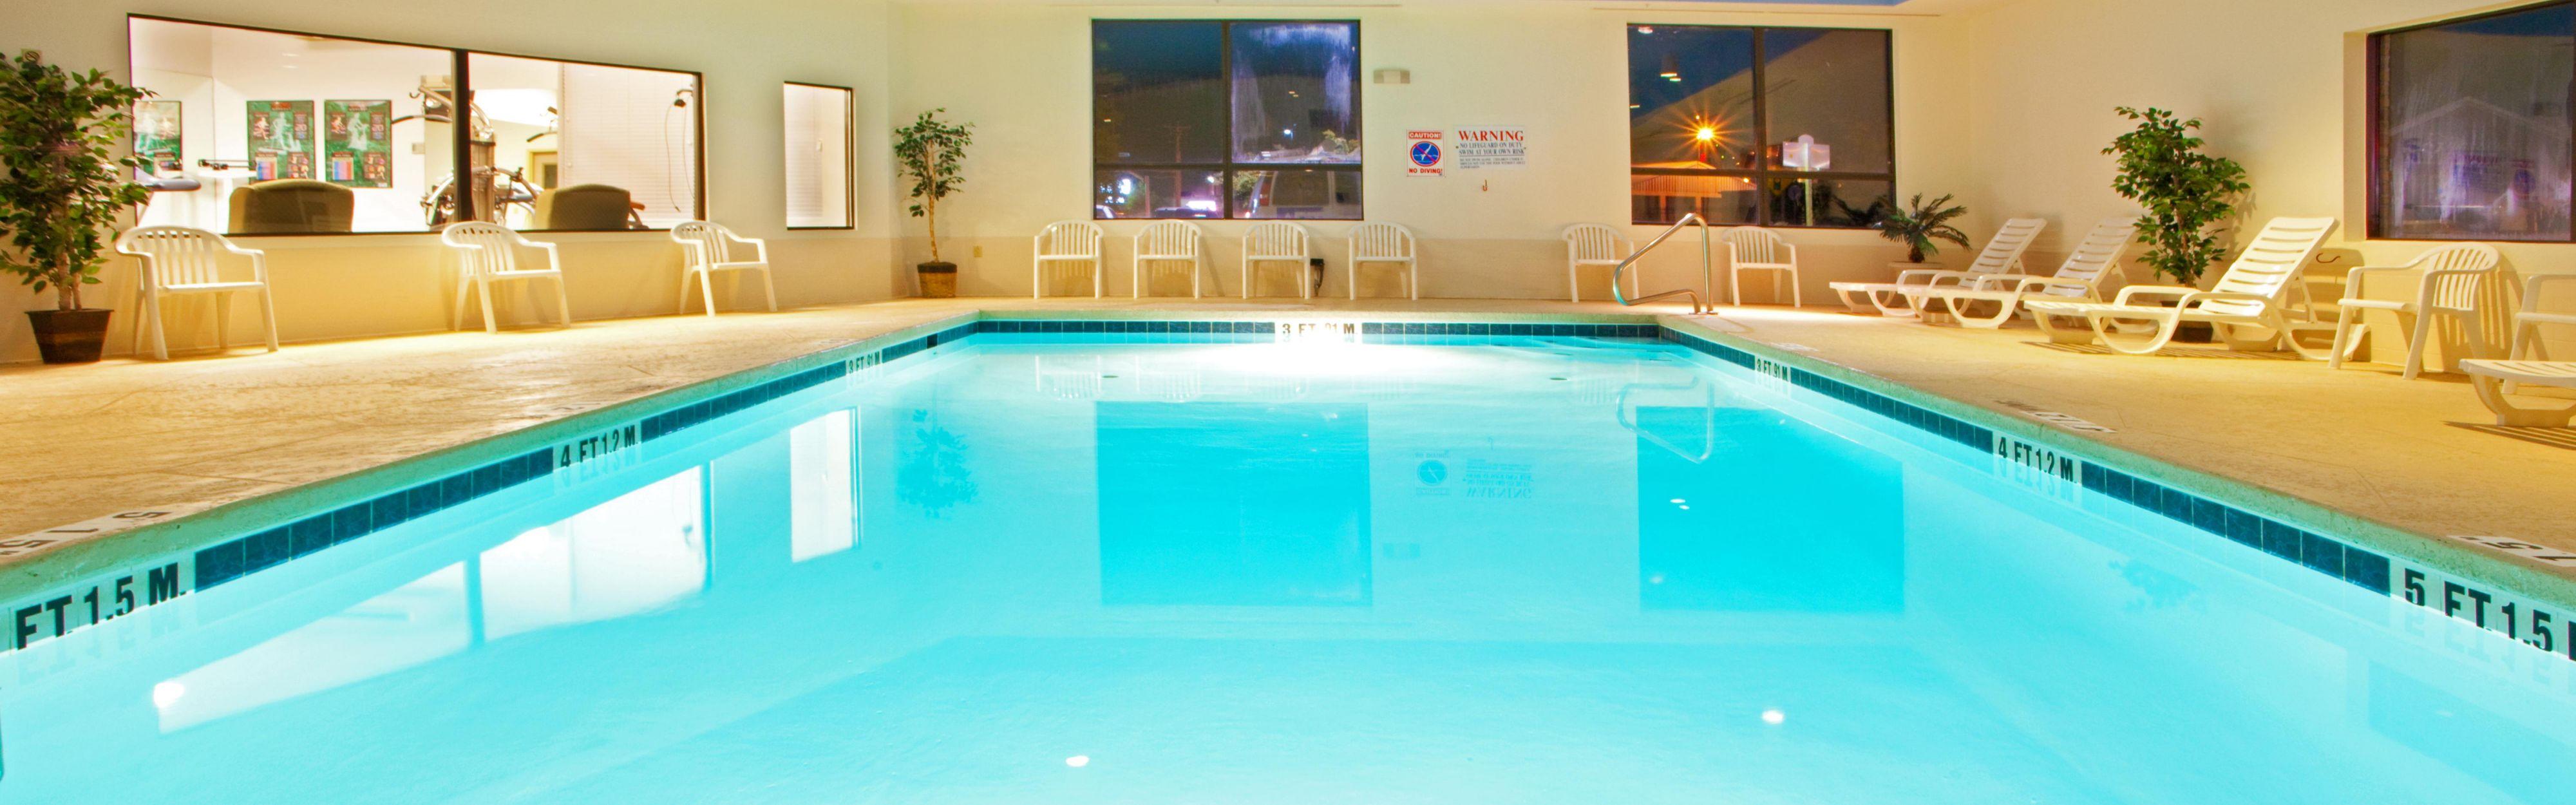 Pocomoke City Hotels